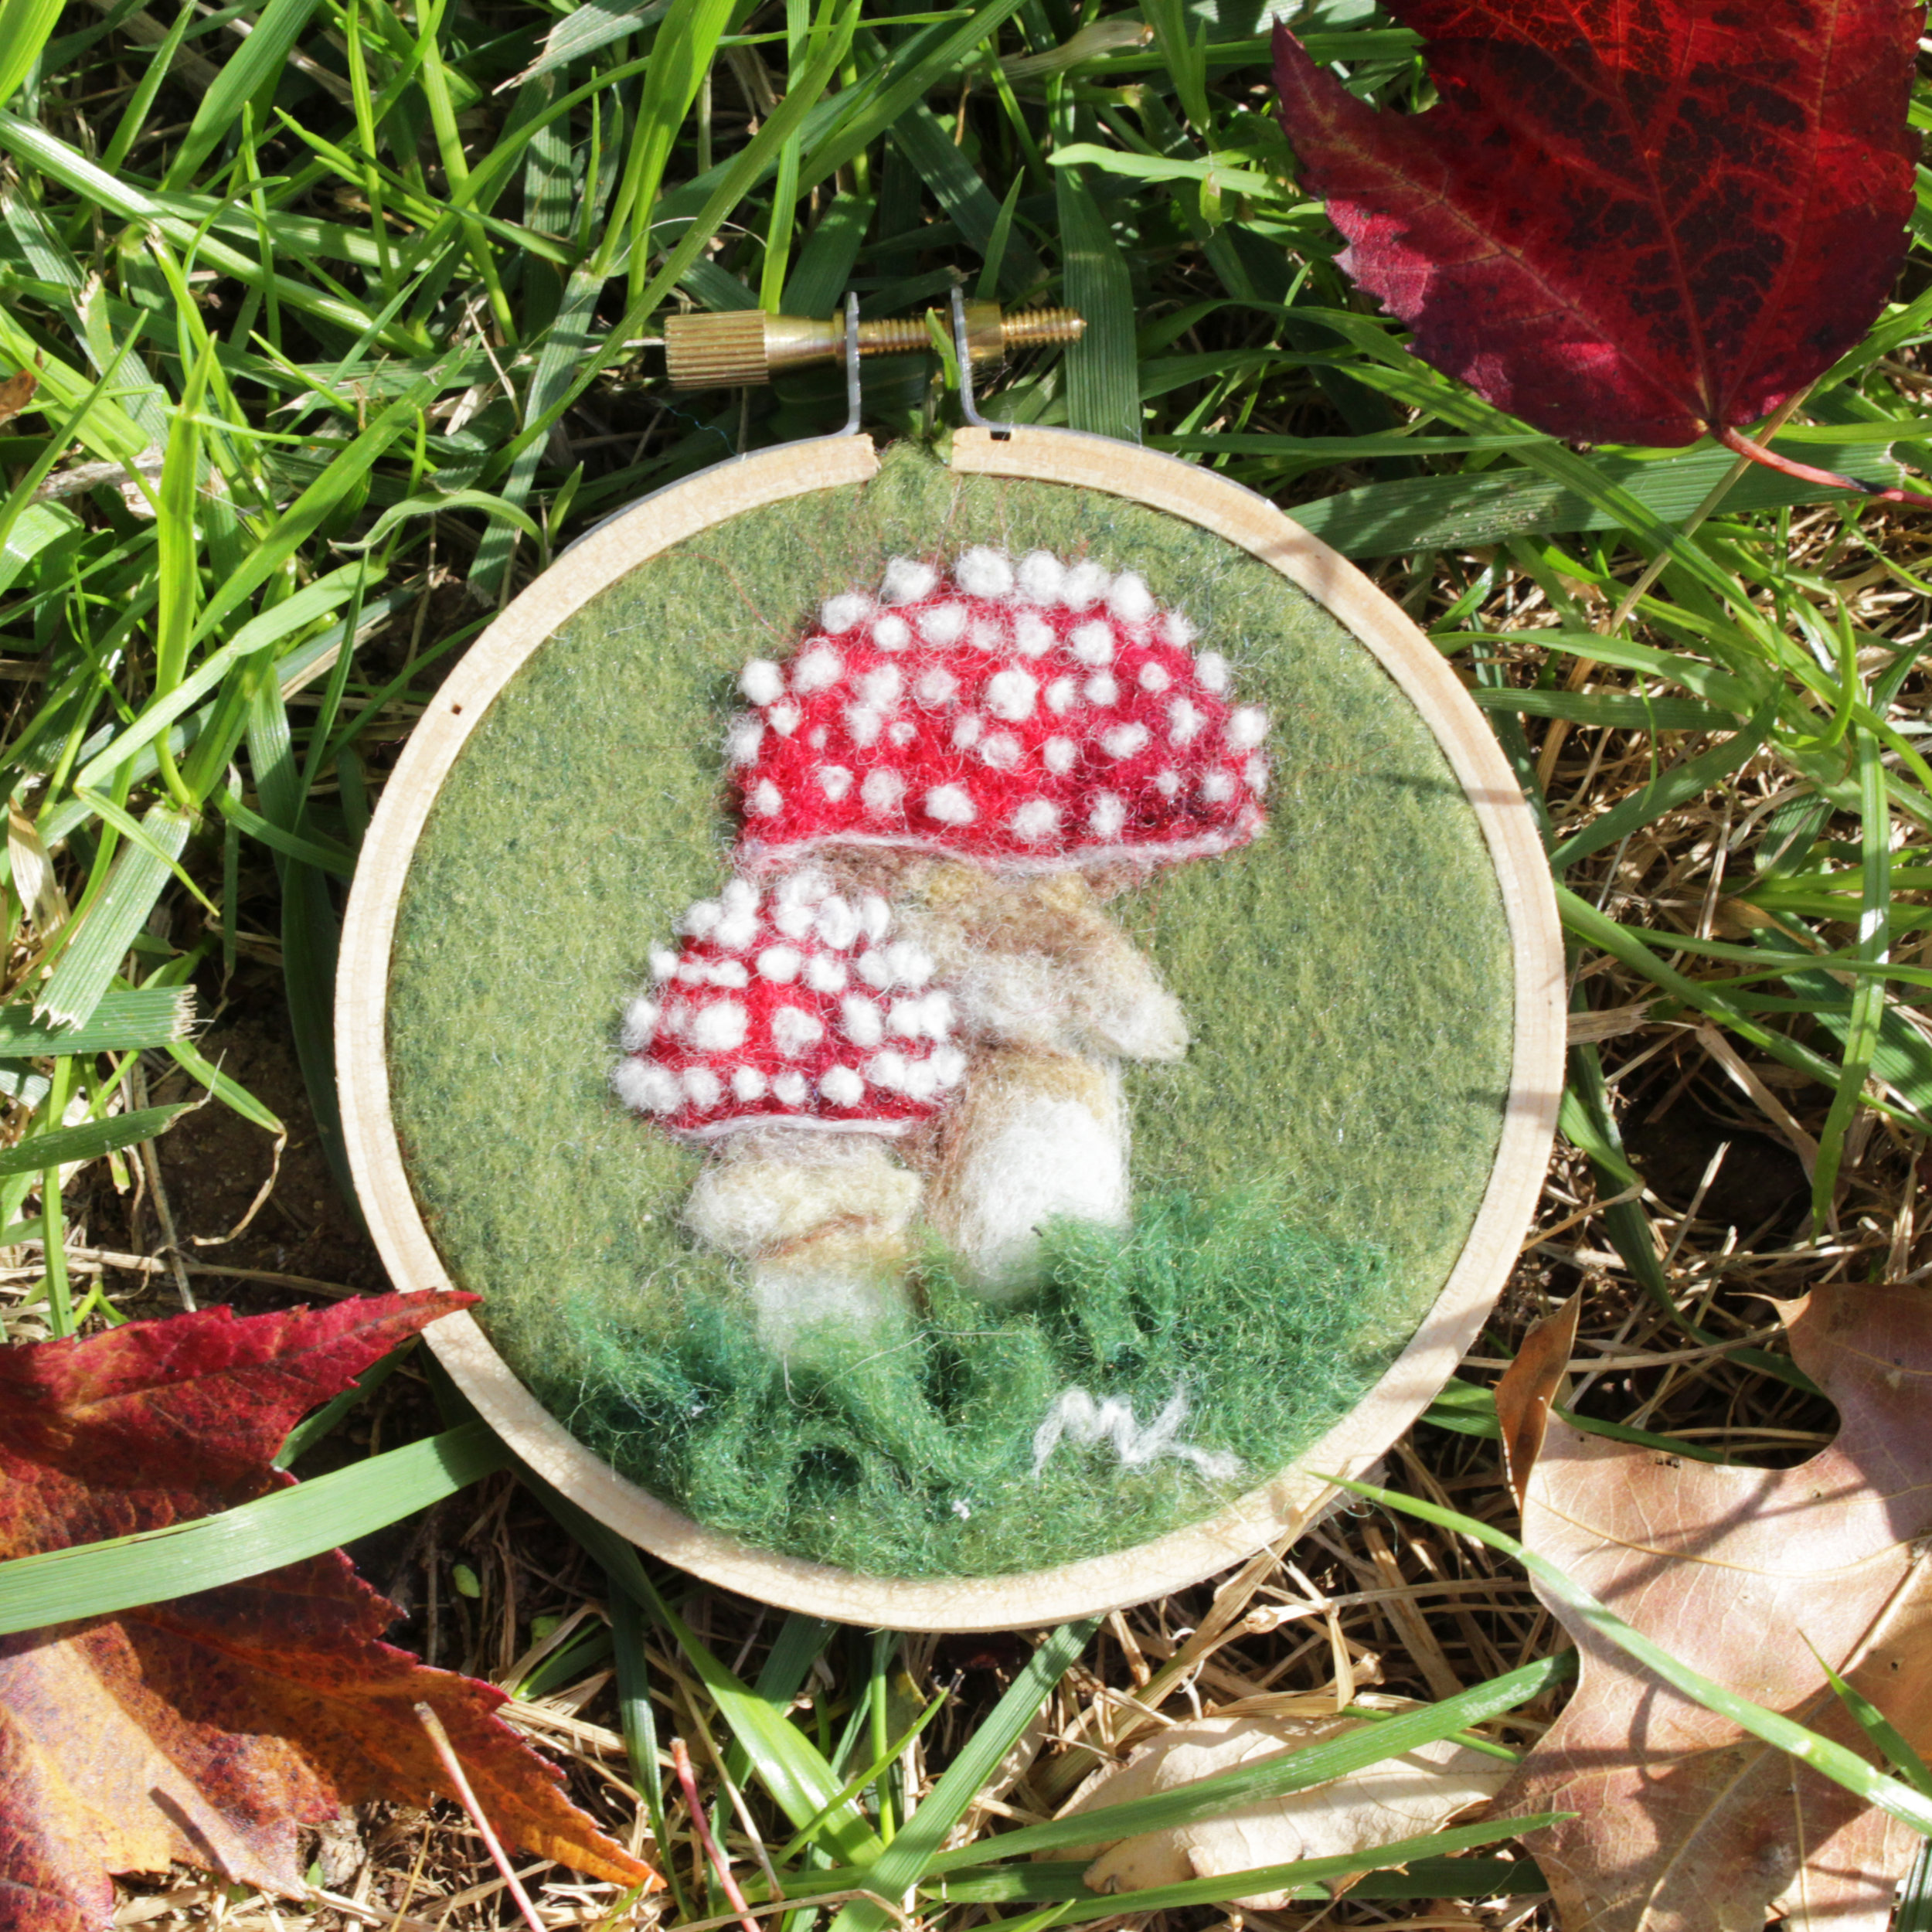 """Muchomory"" - needle felted art on 3"" embroidery hoop, Magi Kern 2016"